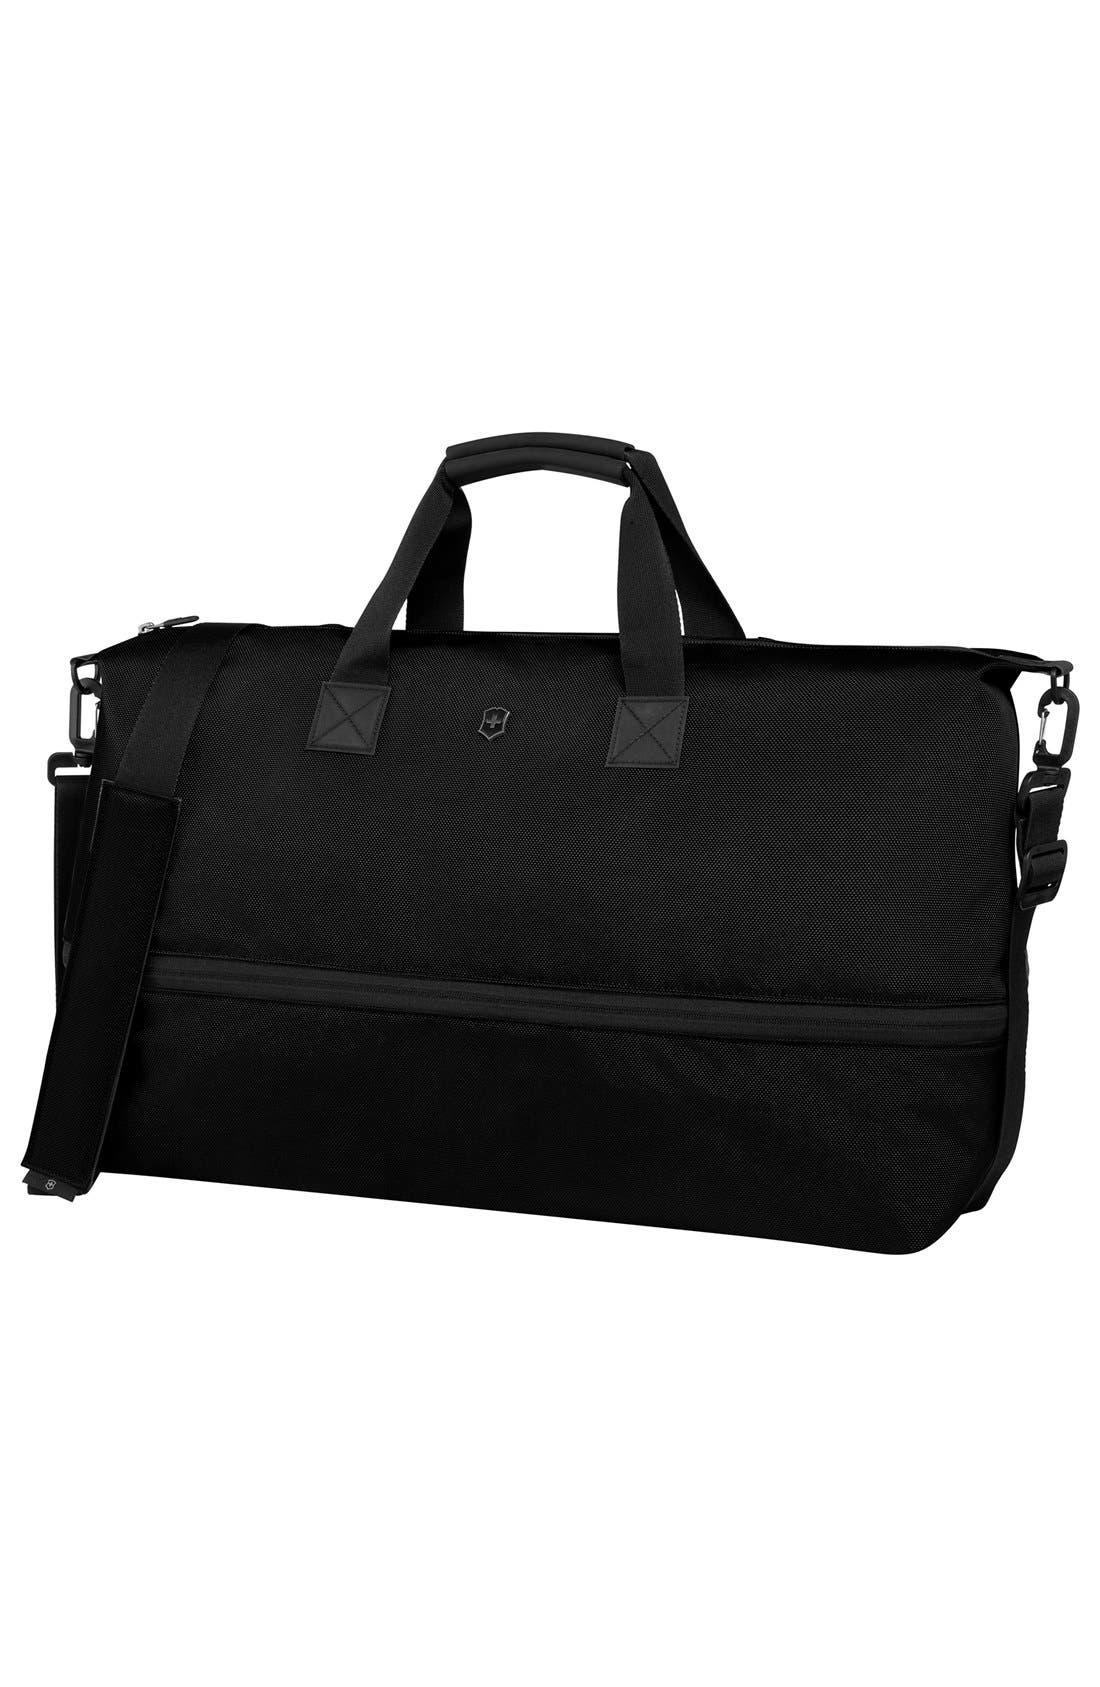 XL Duffel Bag,                             Main thumbnail 1, color,                             BLACK